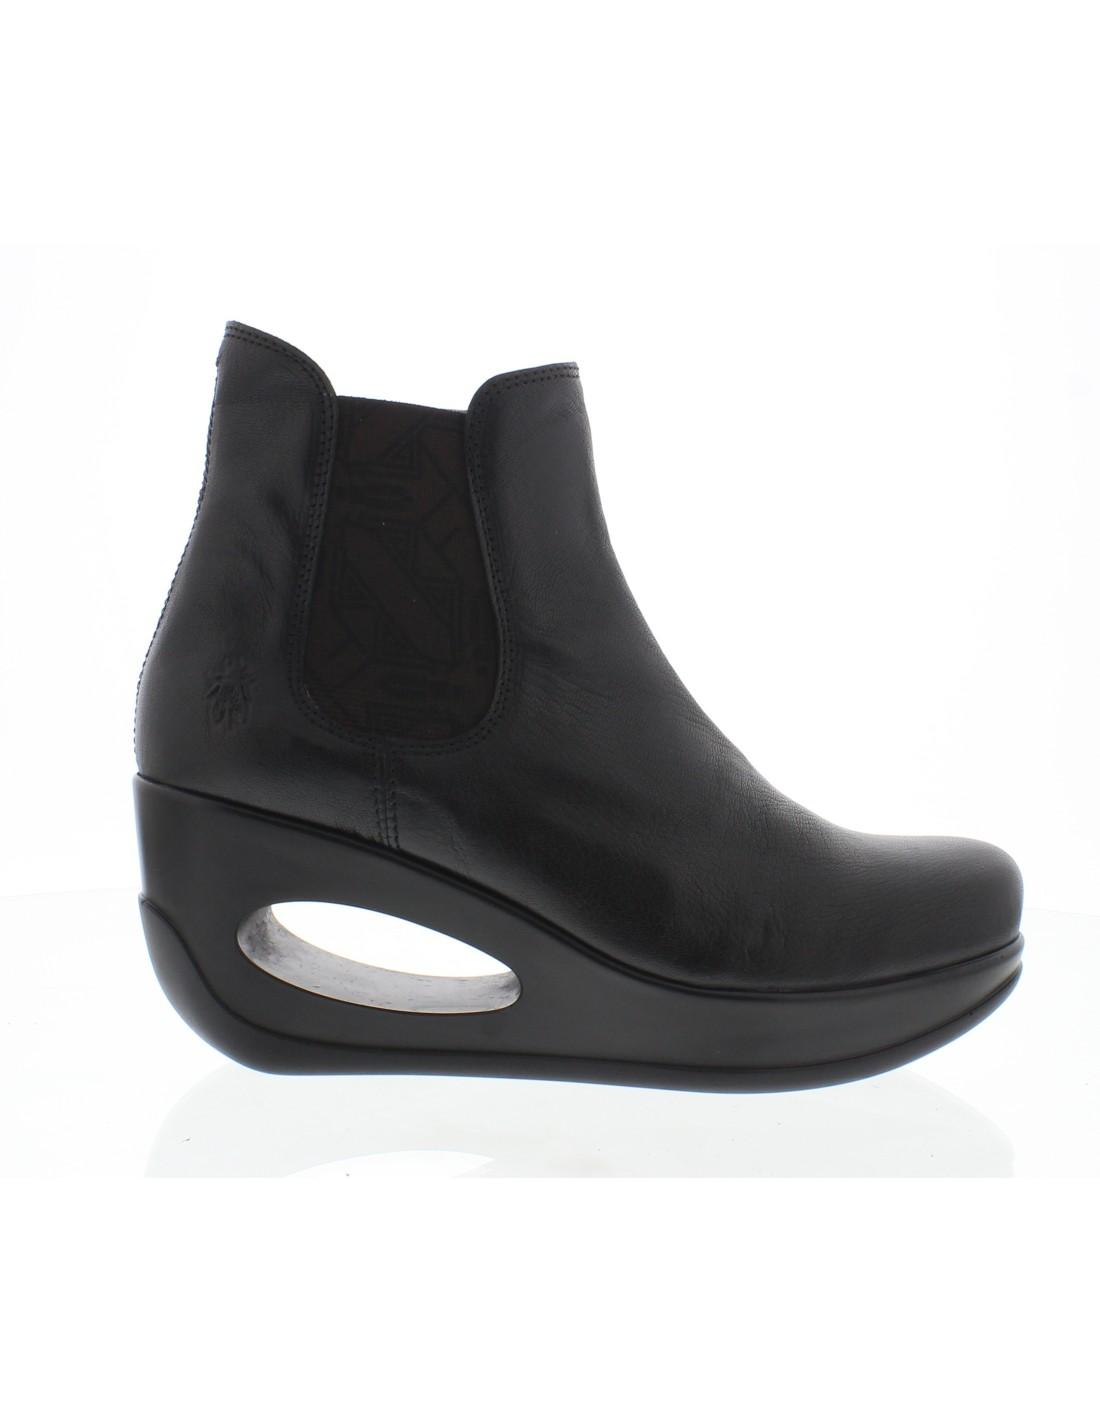 acfb0a4252 bota mujer cuña, bota baja mujer FLY LONDON,comprar bota mujer de ...